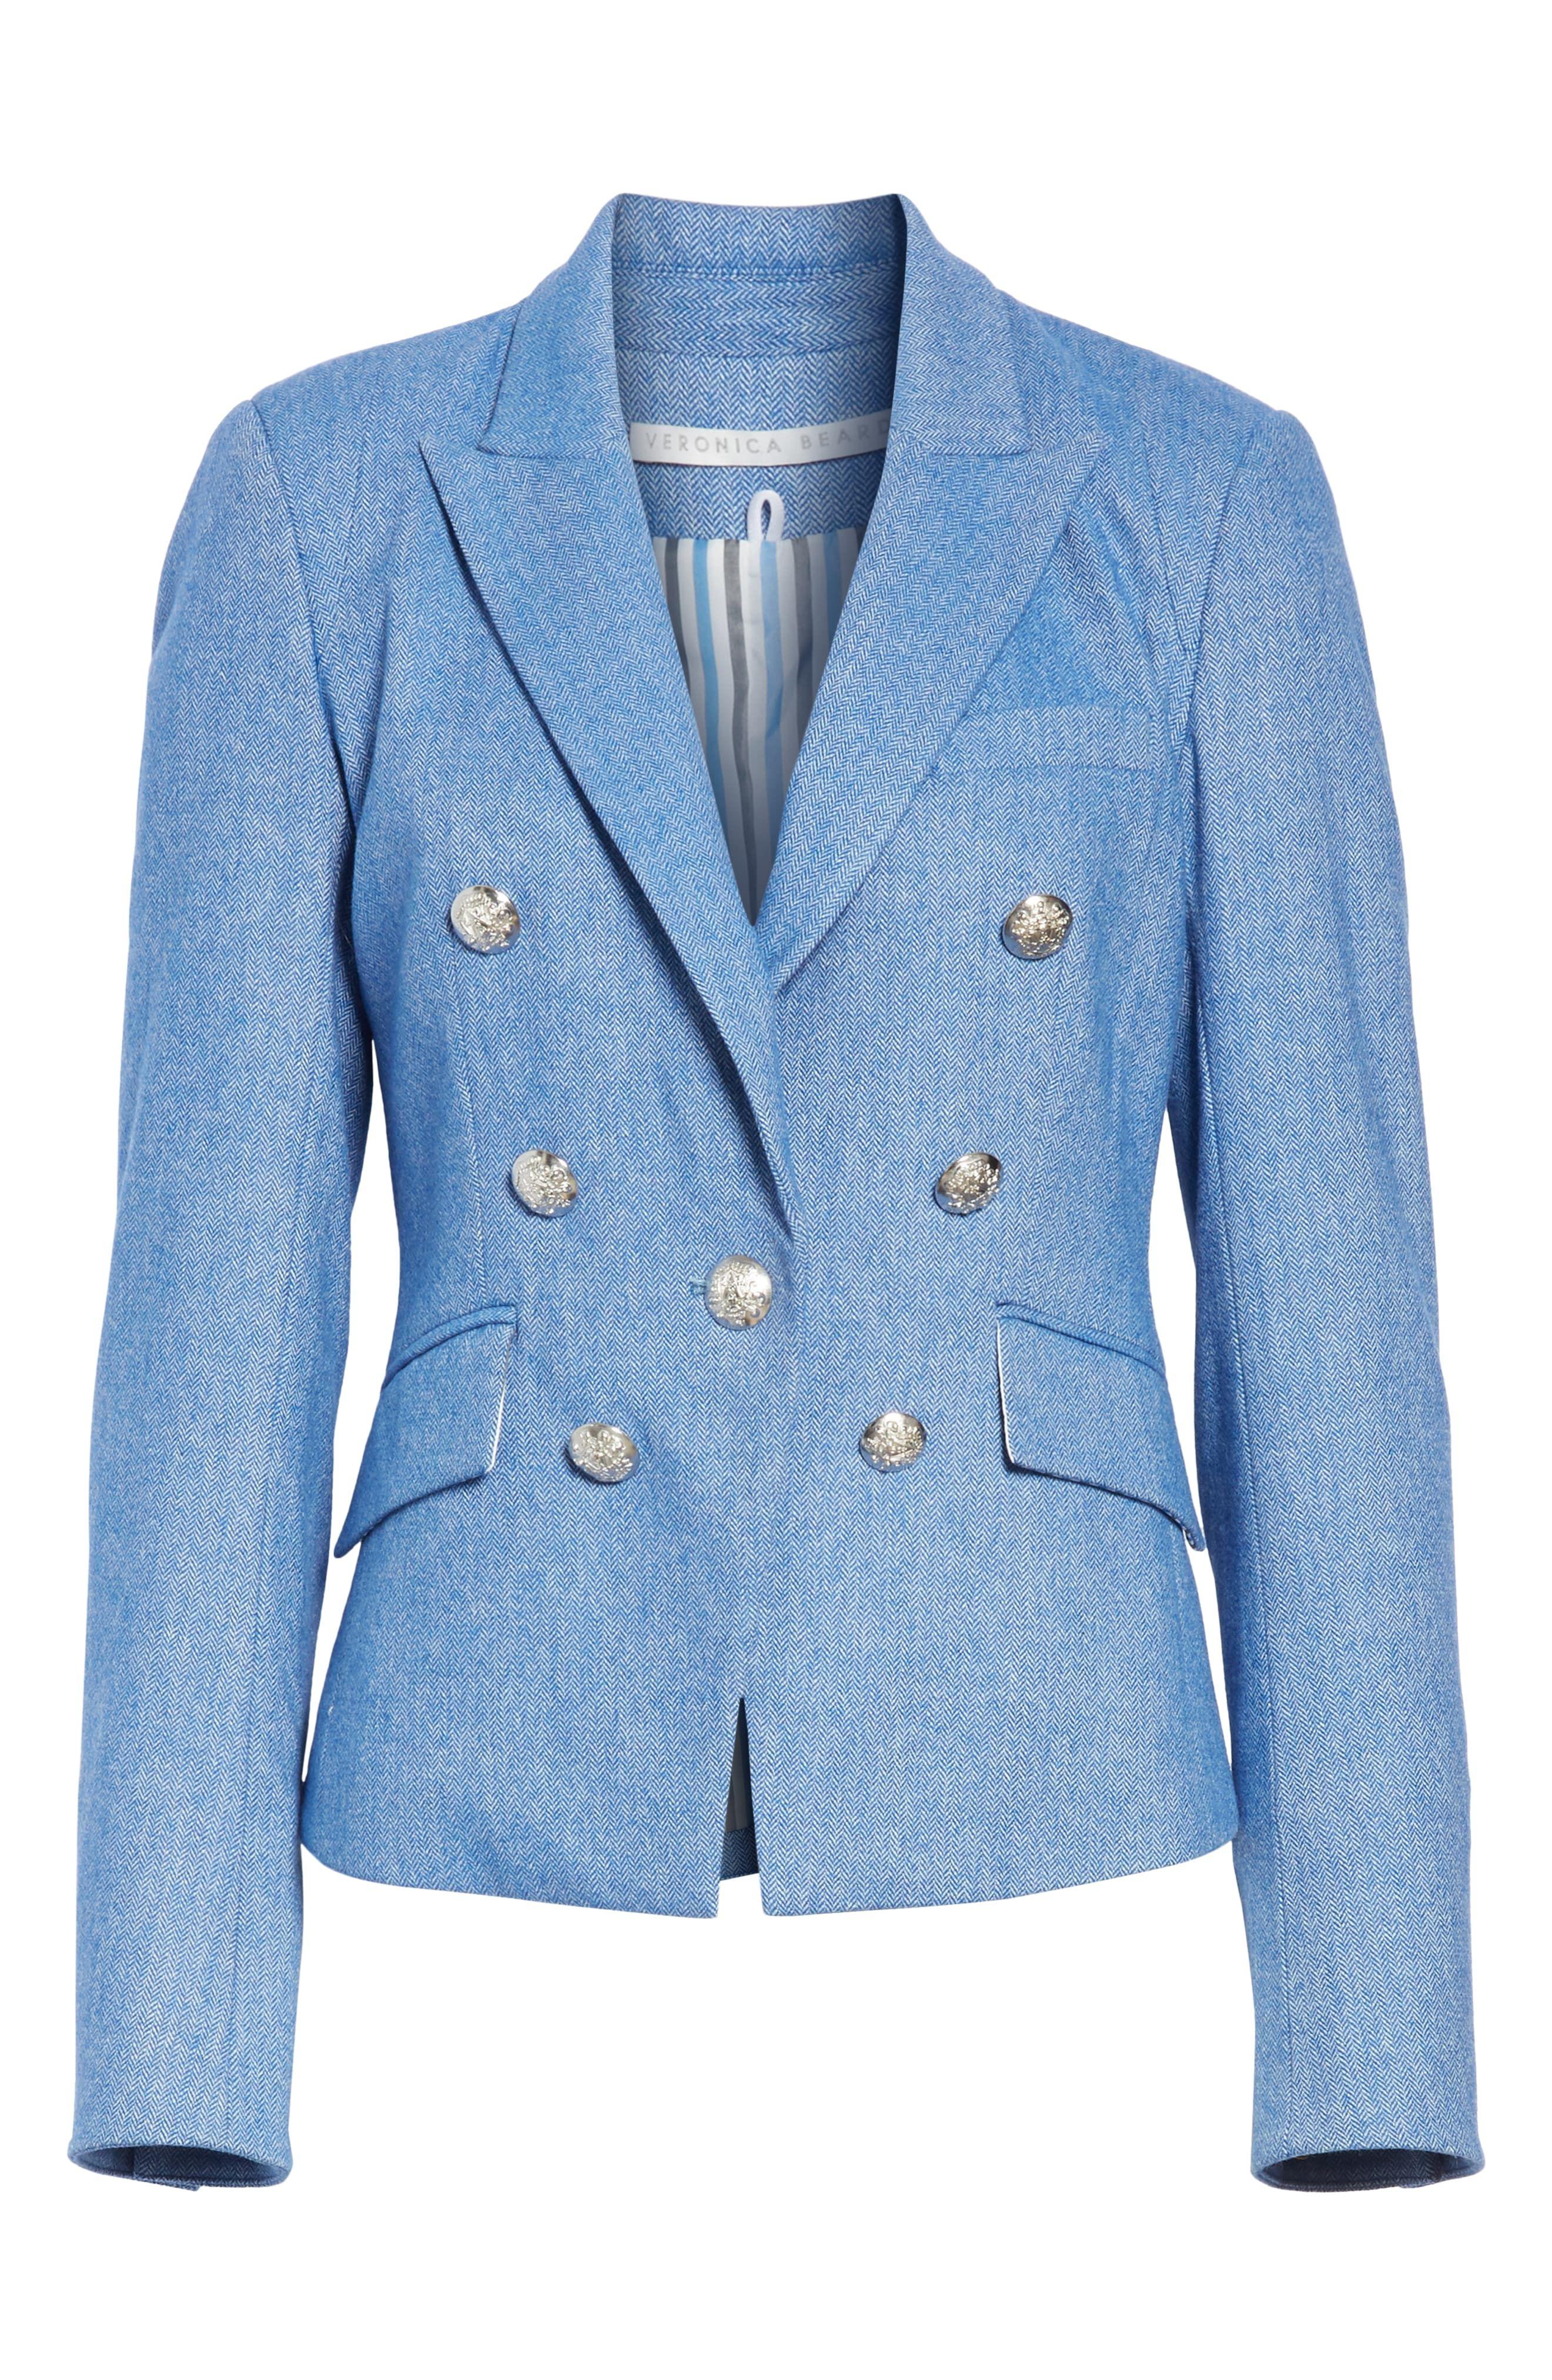 dbebd8e65ad4 Women's Veronica Beard Diego Herringbone Dickey Jacket, Size 14 - Blue